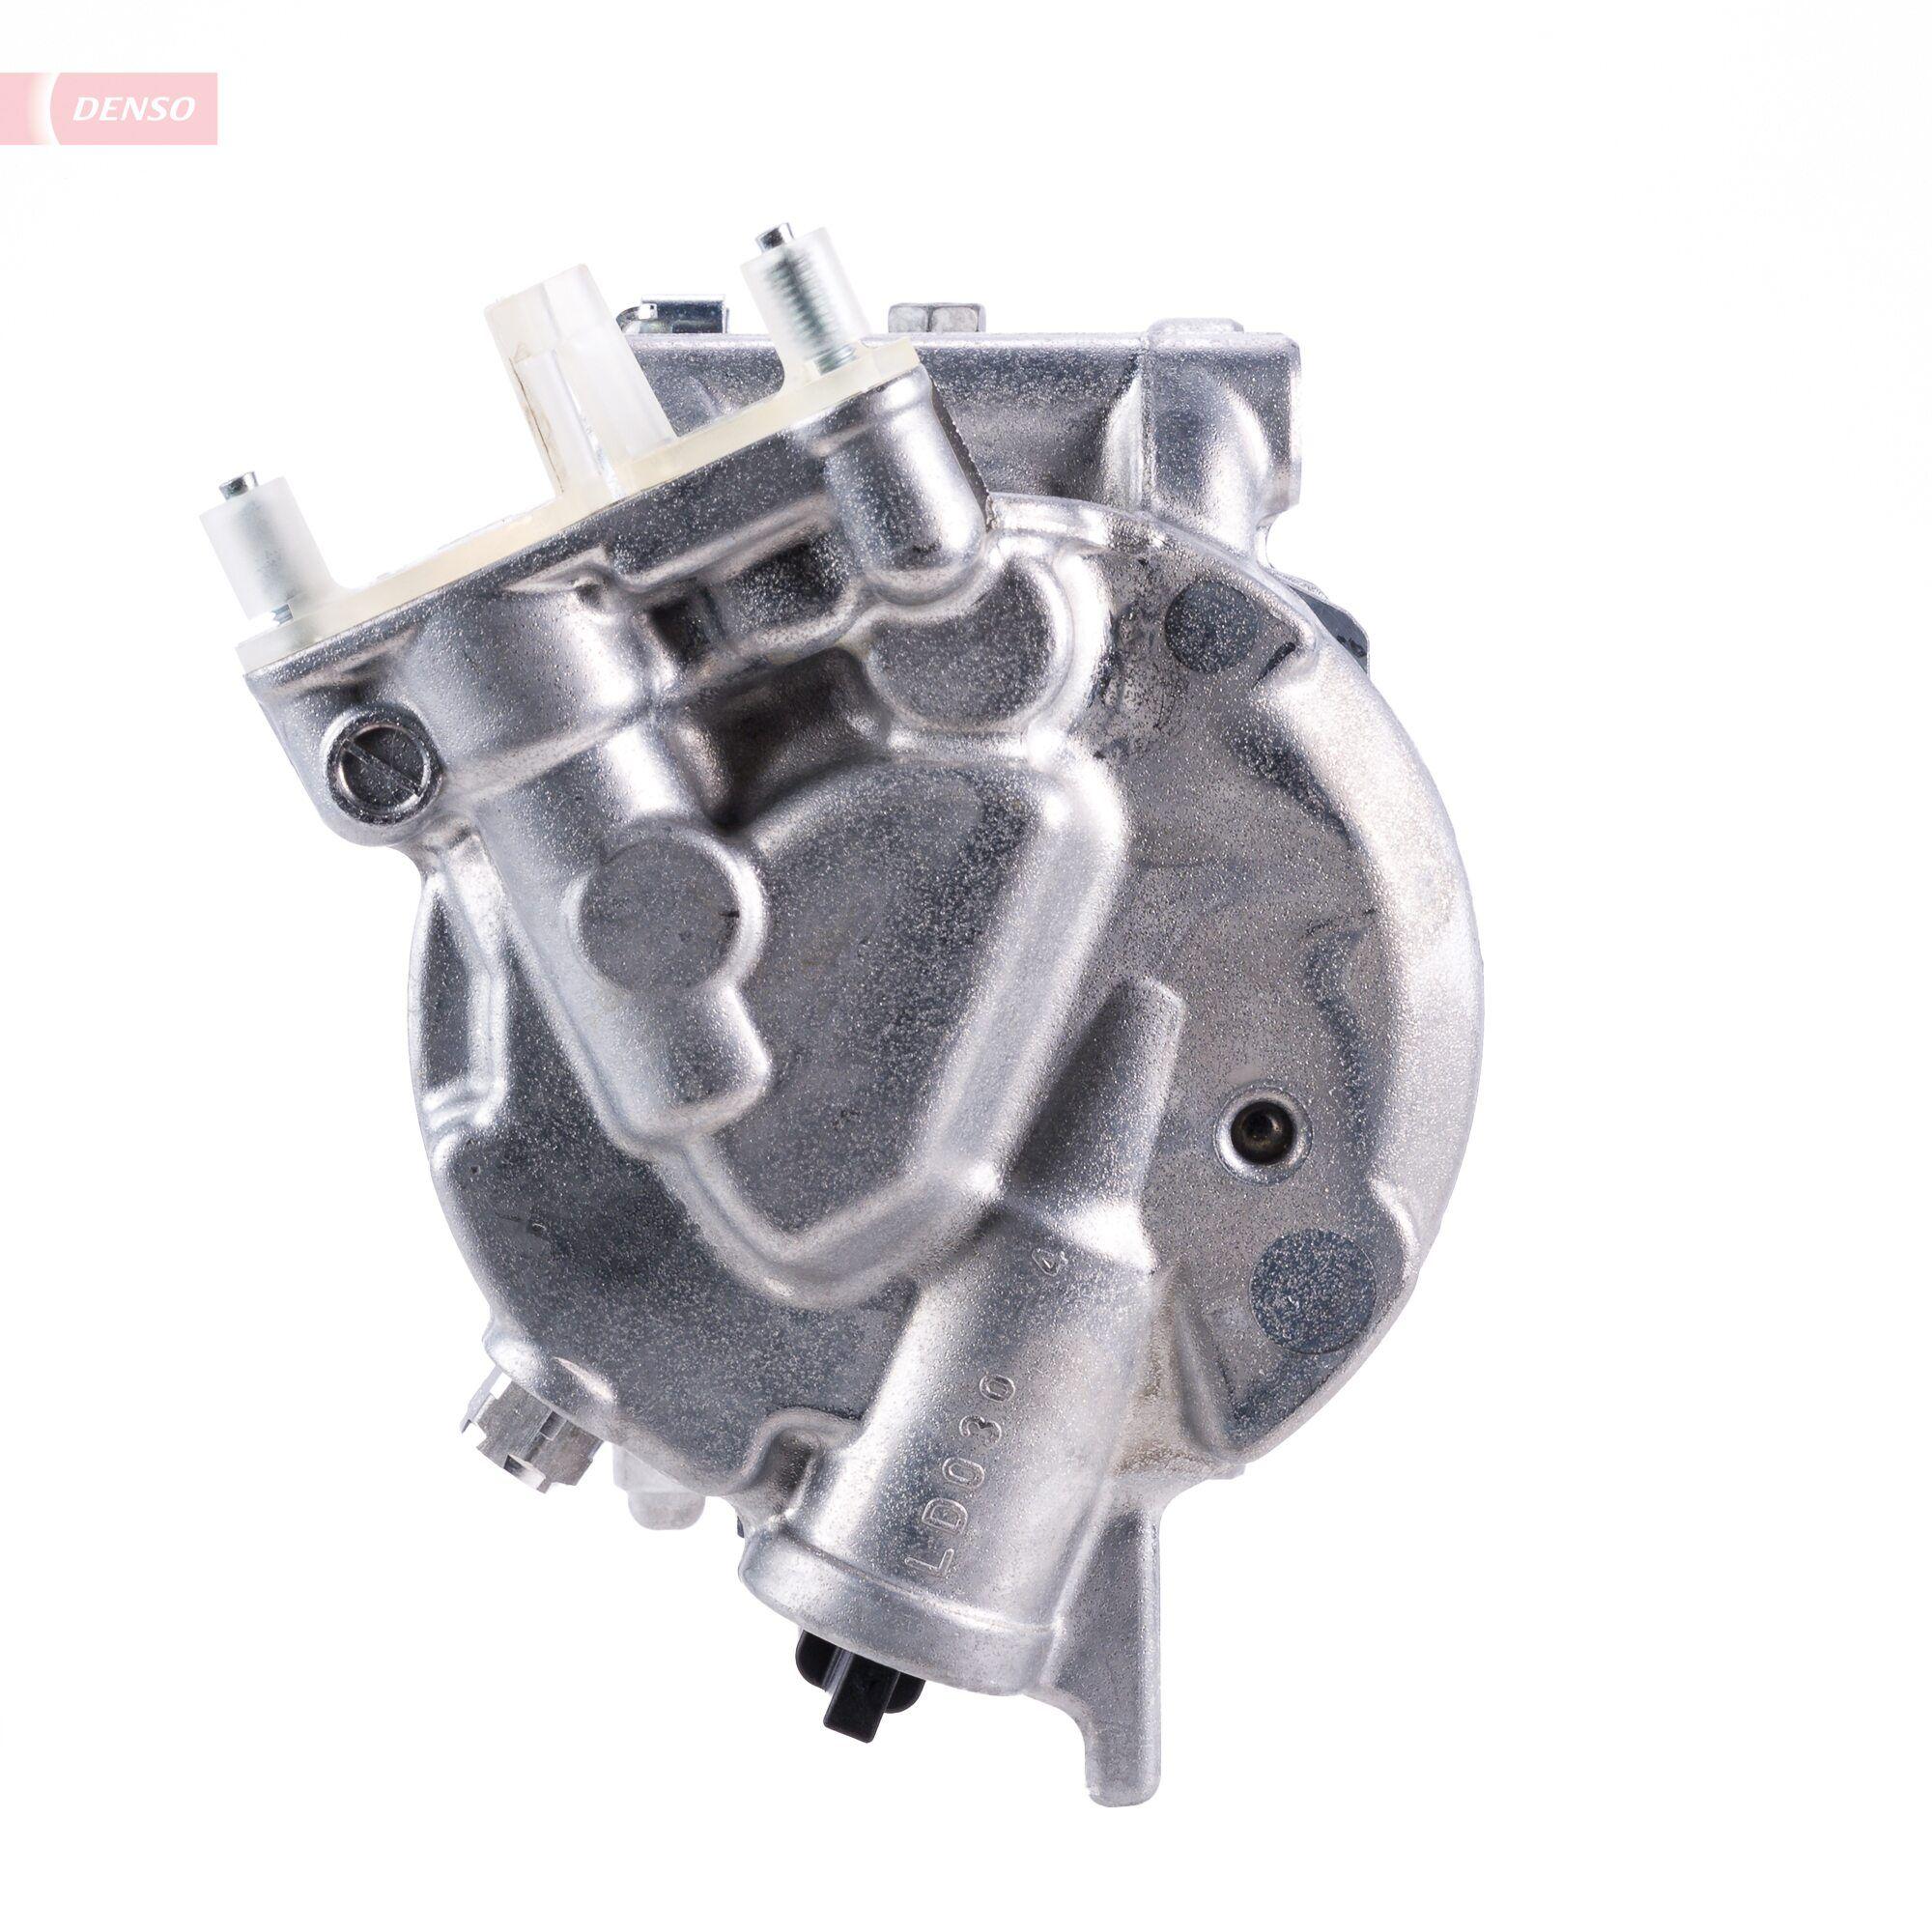 DCP17010 Klimaanlage Kompressor DENSO - Markenprodukte billig